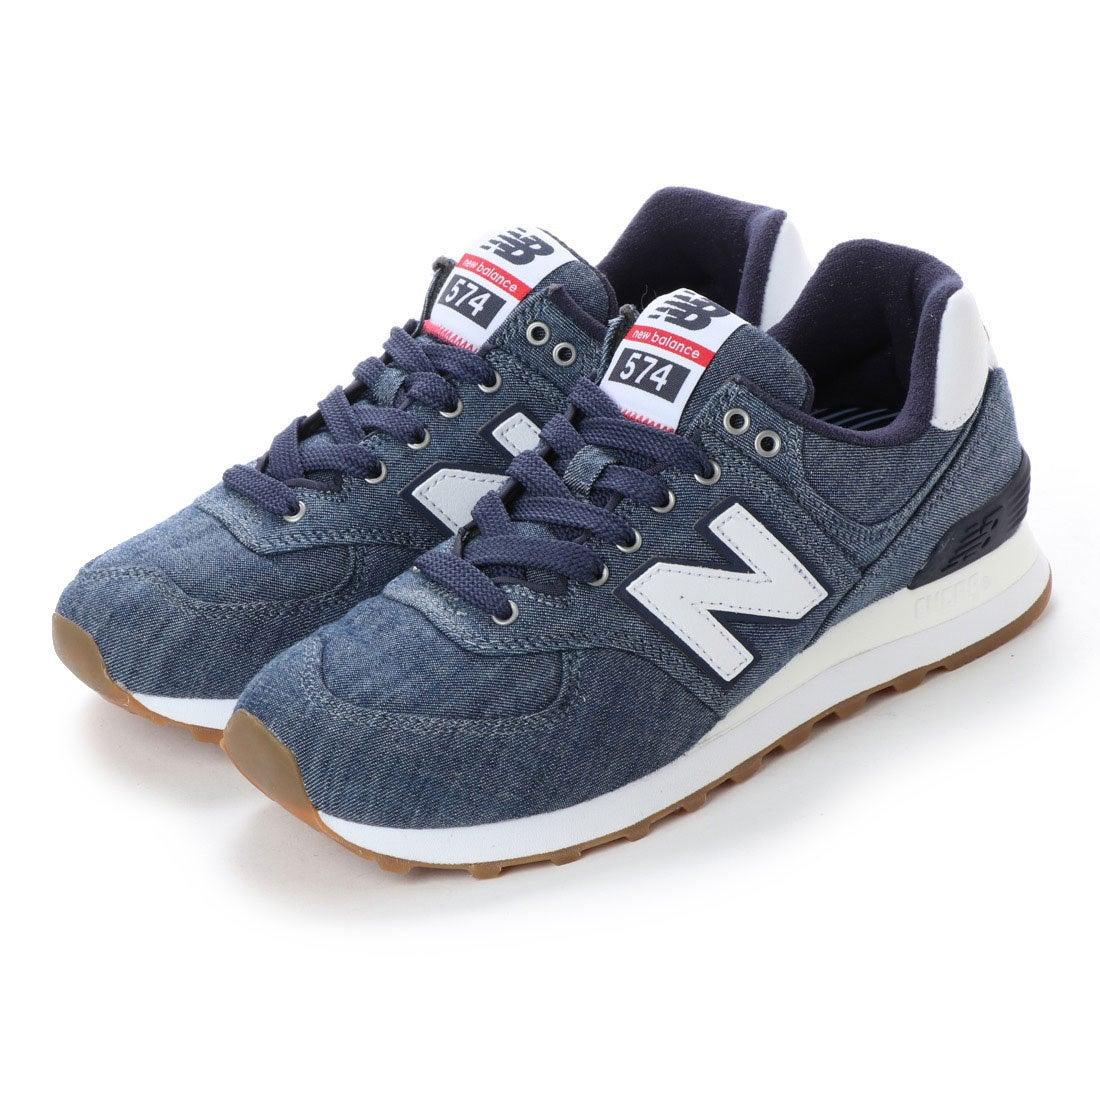 e9c5055fd42aa ニューバランス new balance NB ML574 YLE (YLE(ビンテージインディゴ)) -靴&ファッション通販  ロコンド〜自宅で試着、気軽に返品